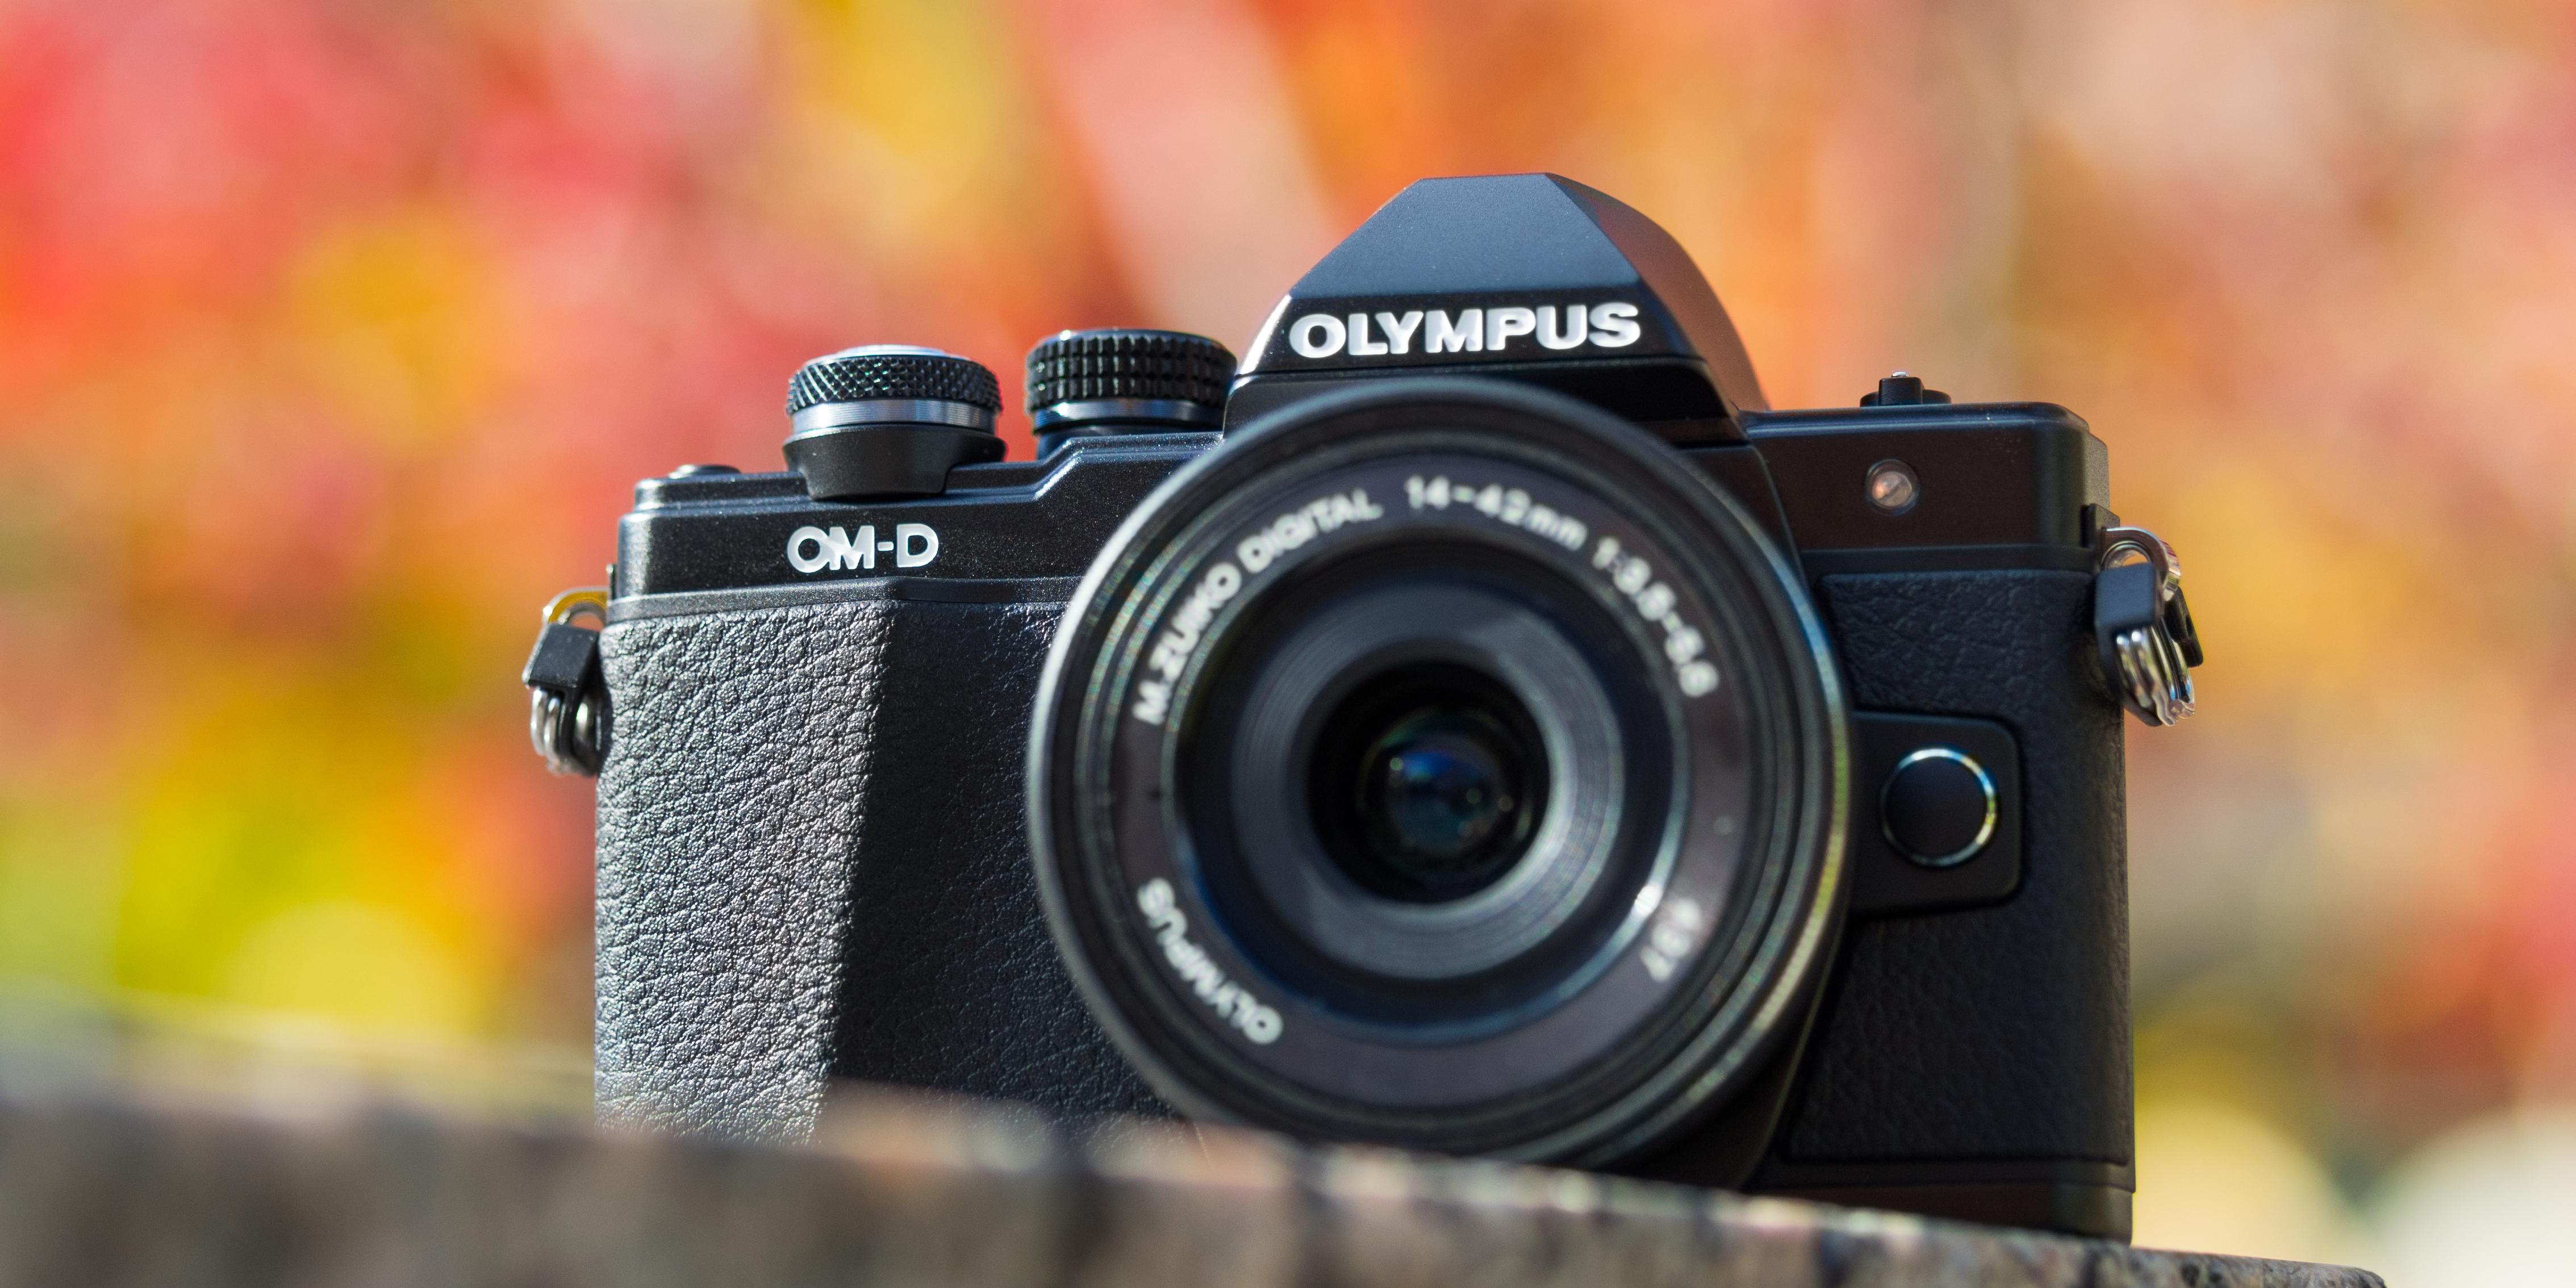 Camera Best Mirrorless Camera Under 1000 the best cameras under 1000 of 2017 reviewed com olympus e m10 mark ii hero